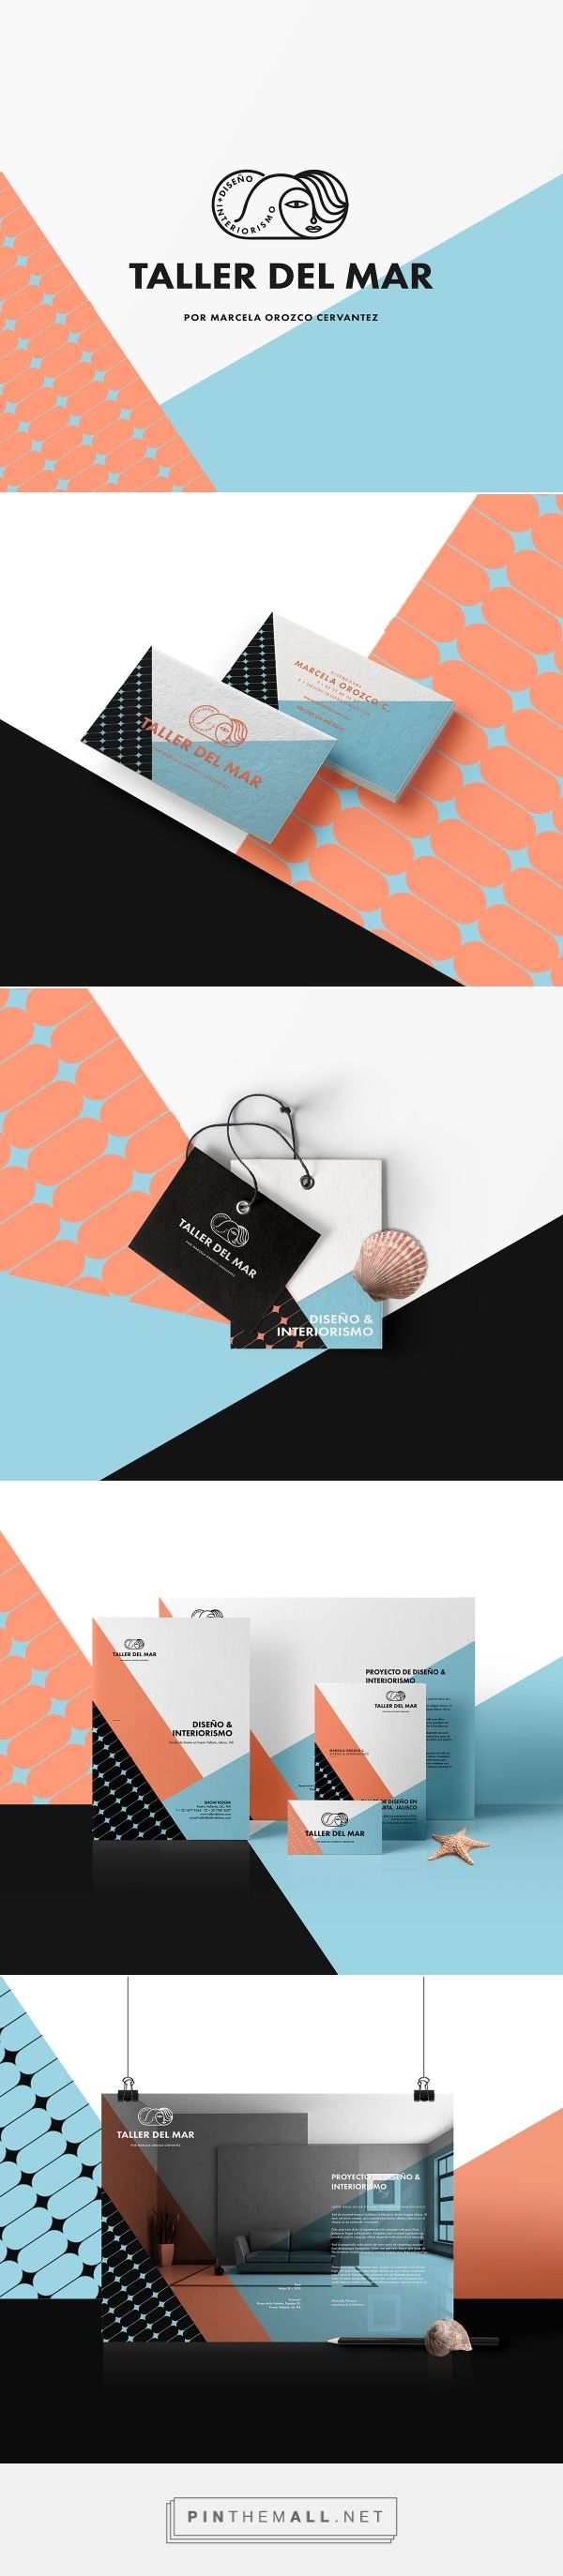 TALLER DEL MAR Design Studio Branding by Omen Studio | Fivestar Branding – Design and Branding Agency & Inspiration Gallery